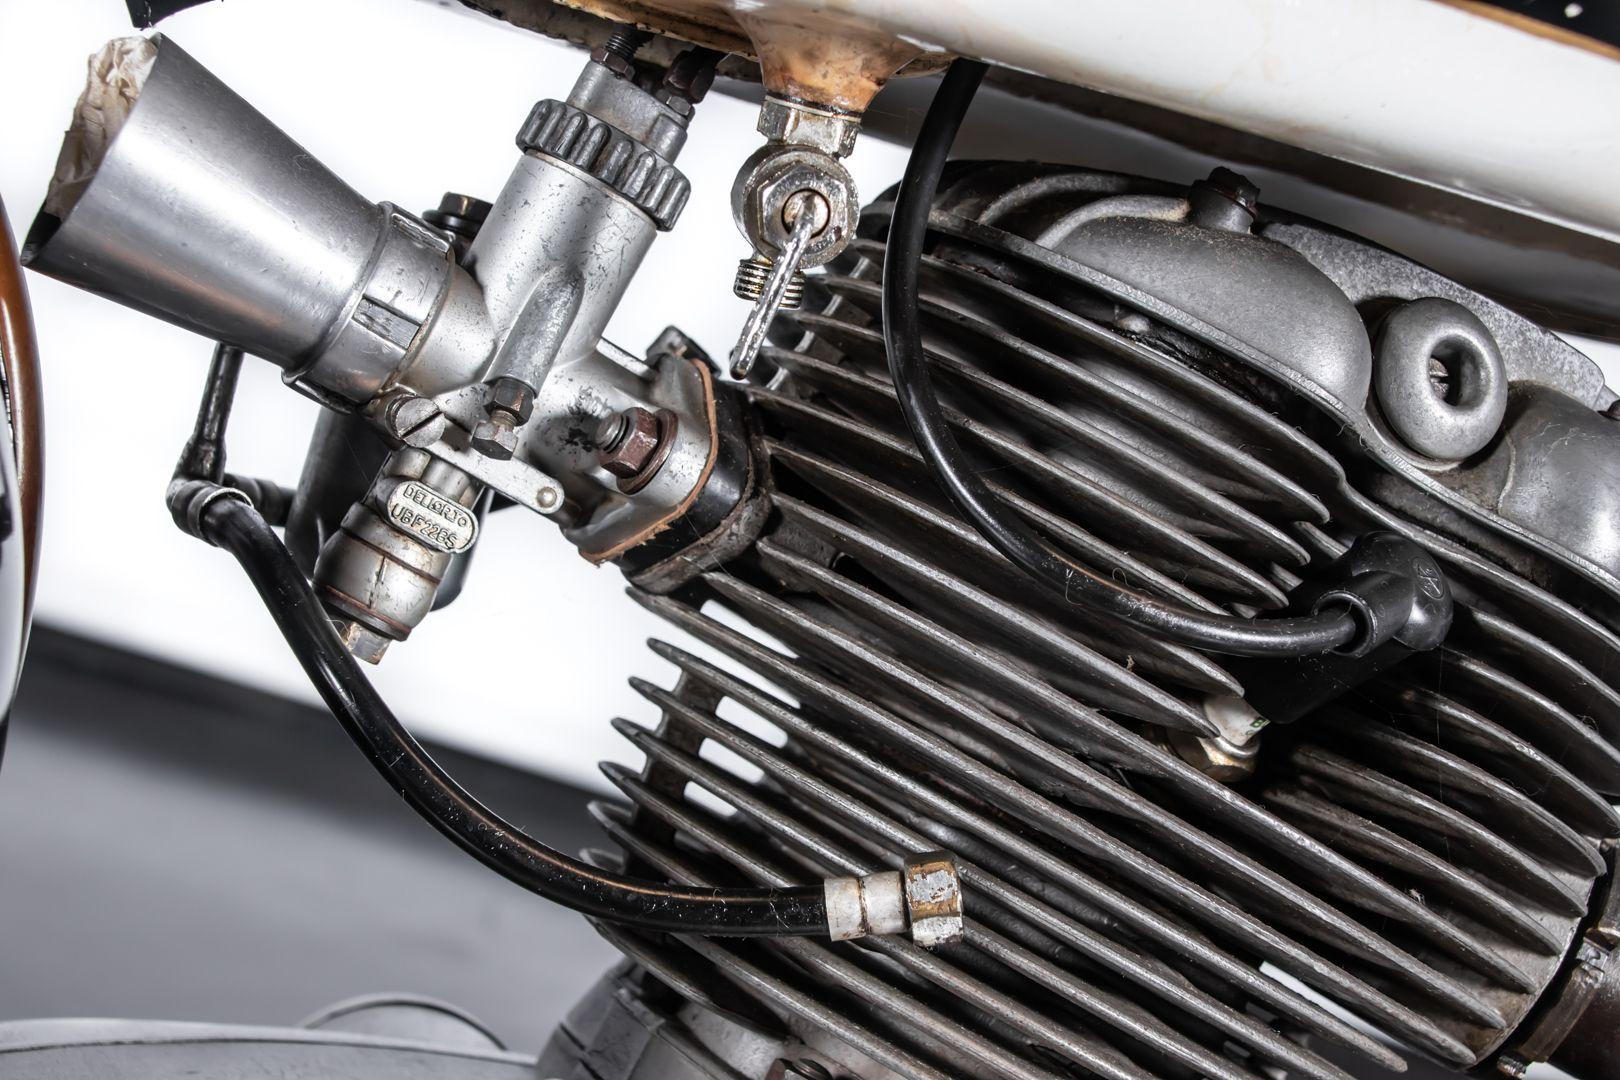 1960 Moto Morini Tresette Sprint 175 76495